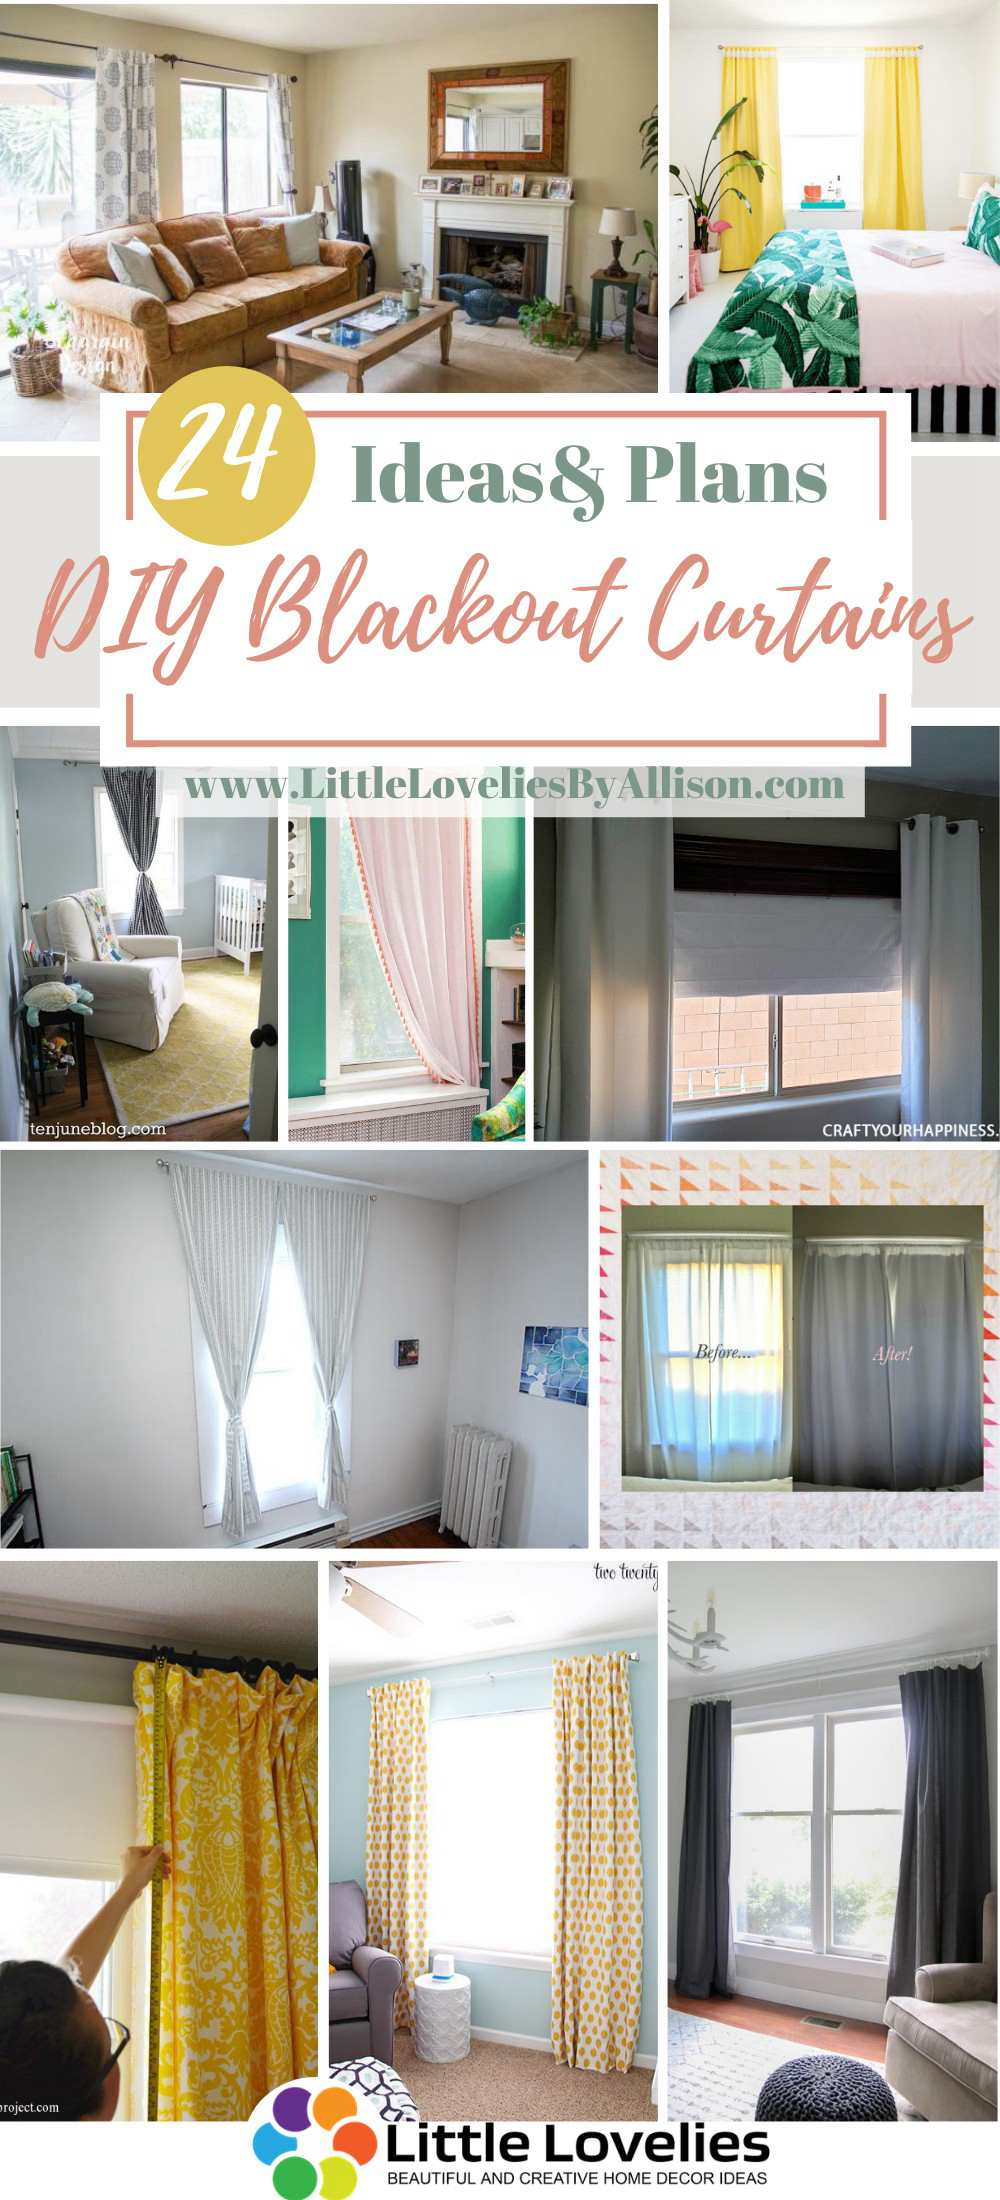 24 homemade blackout curtains ideas you